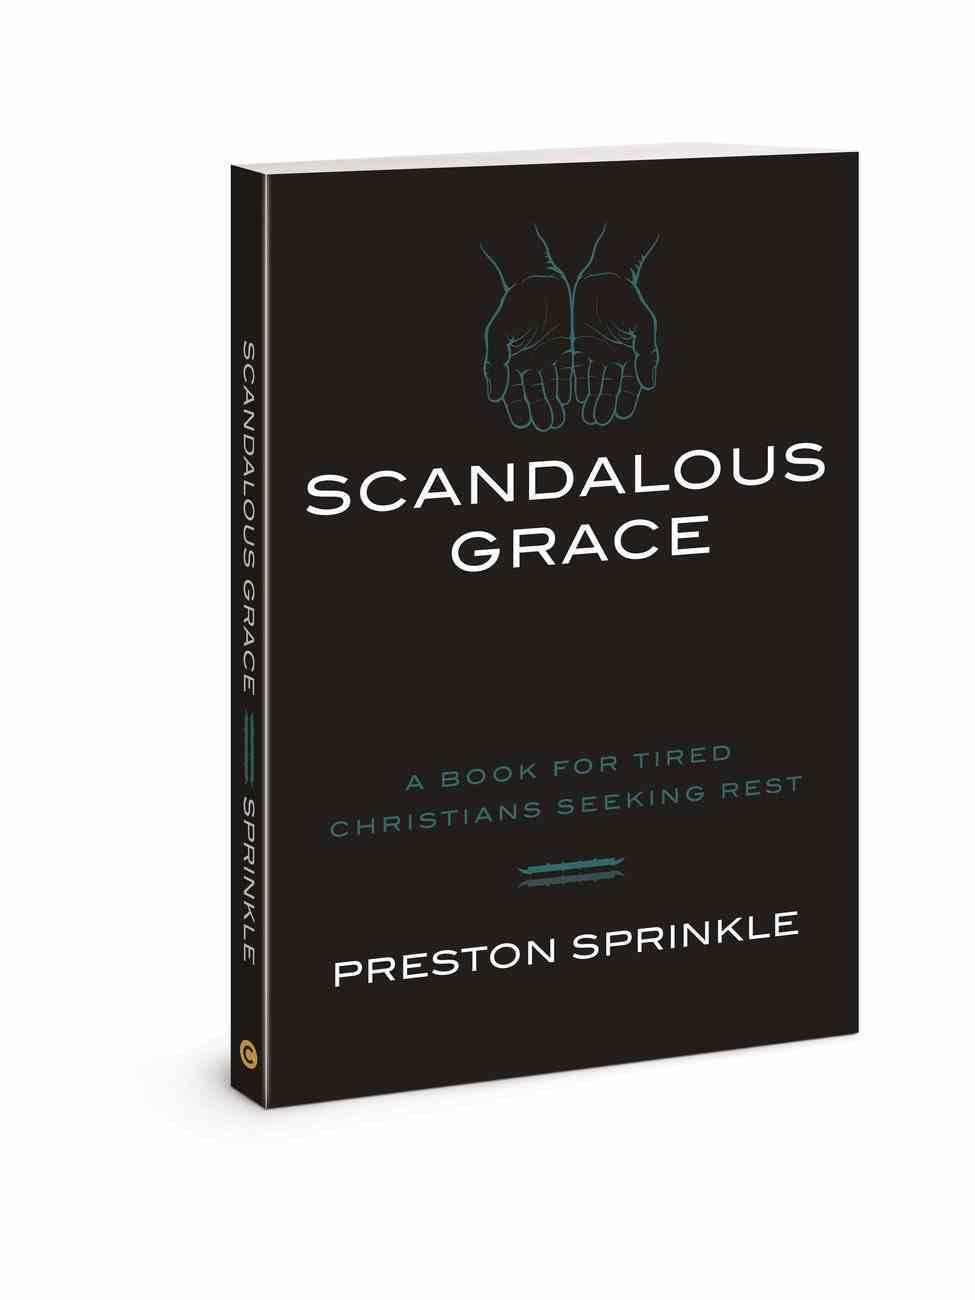 Scandalous Grace: A Book For Tired Christians Seeking Rest Paperback